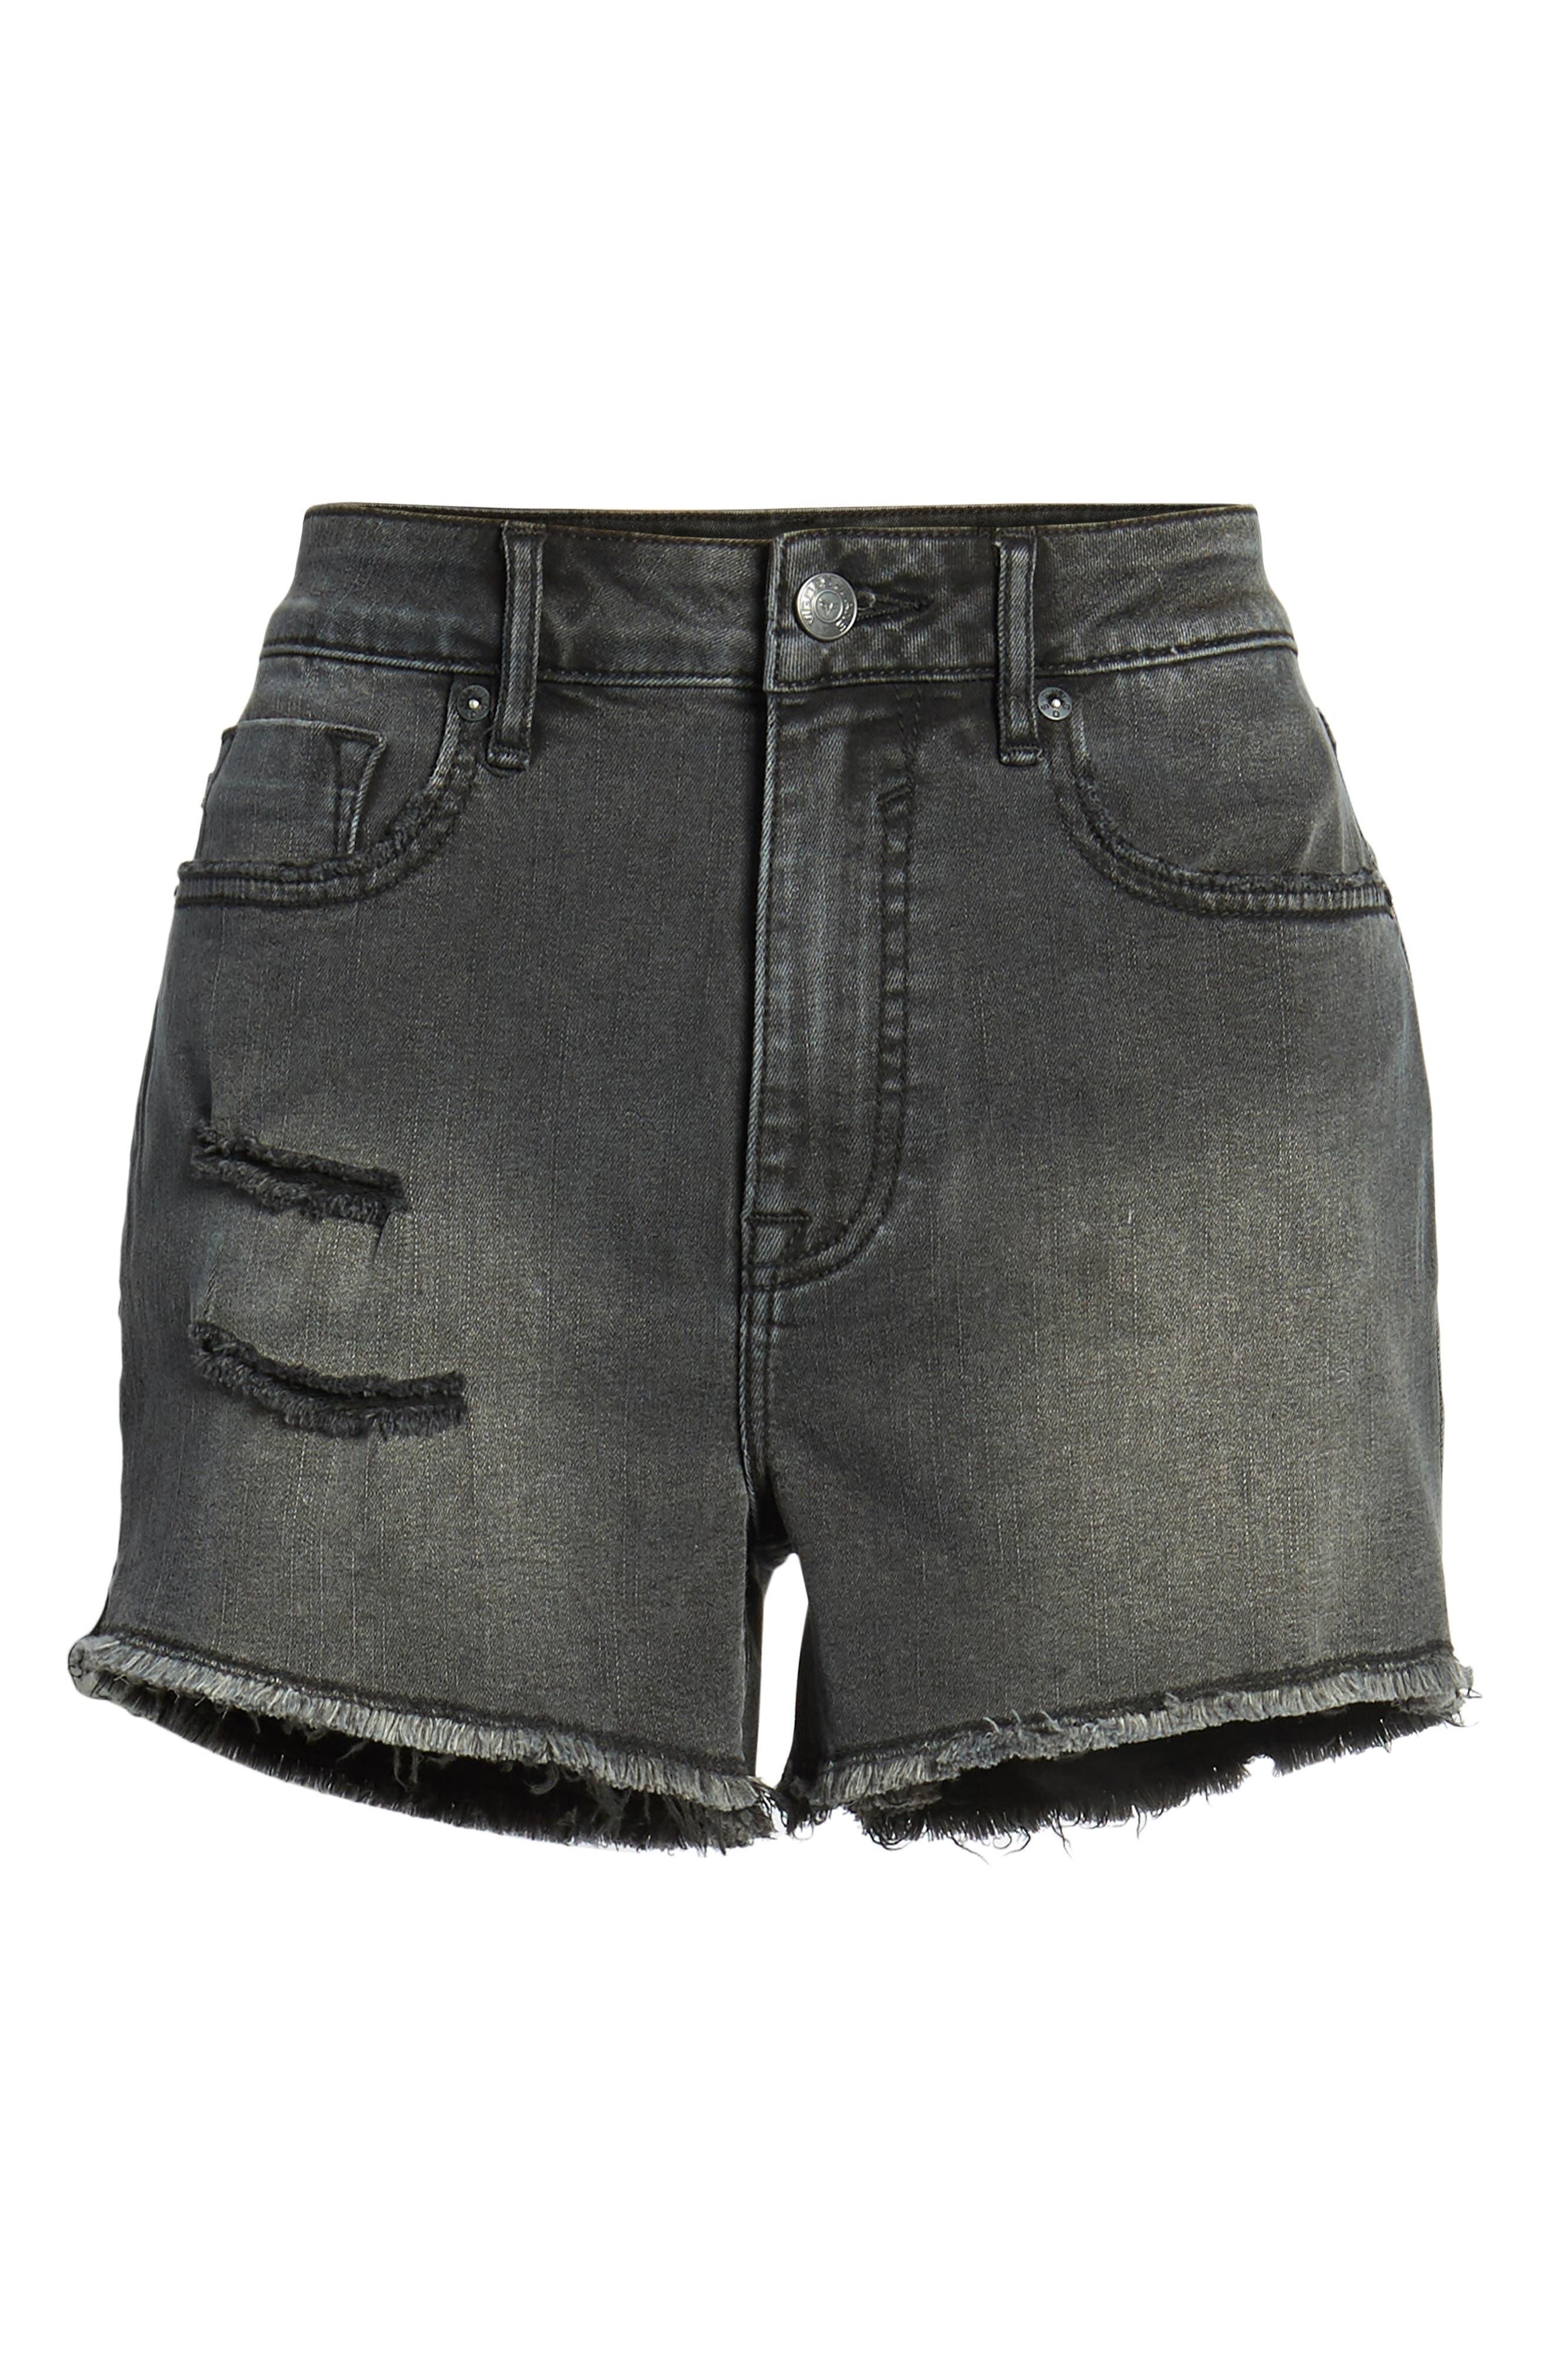 Jagger High Waist Denim Shorts,                             Alternate thumbnail 7, color,                             001